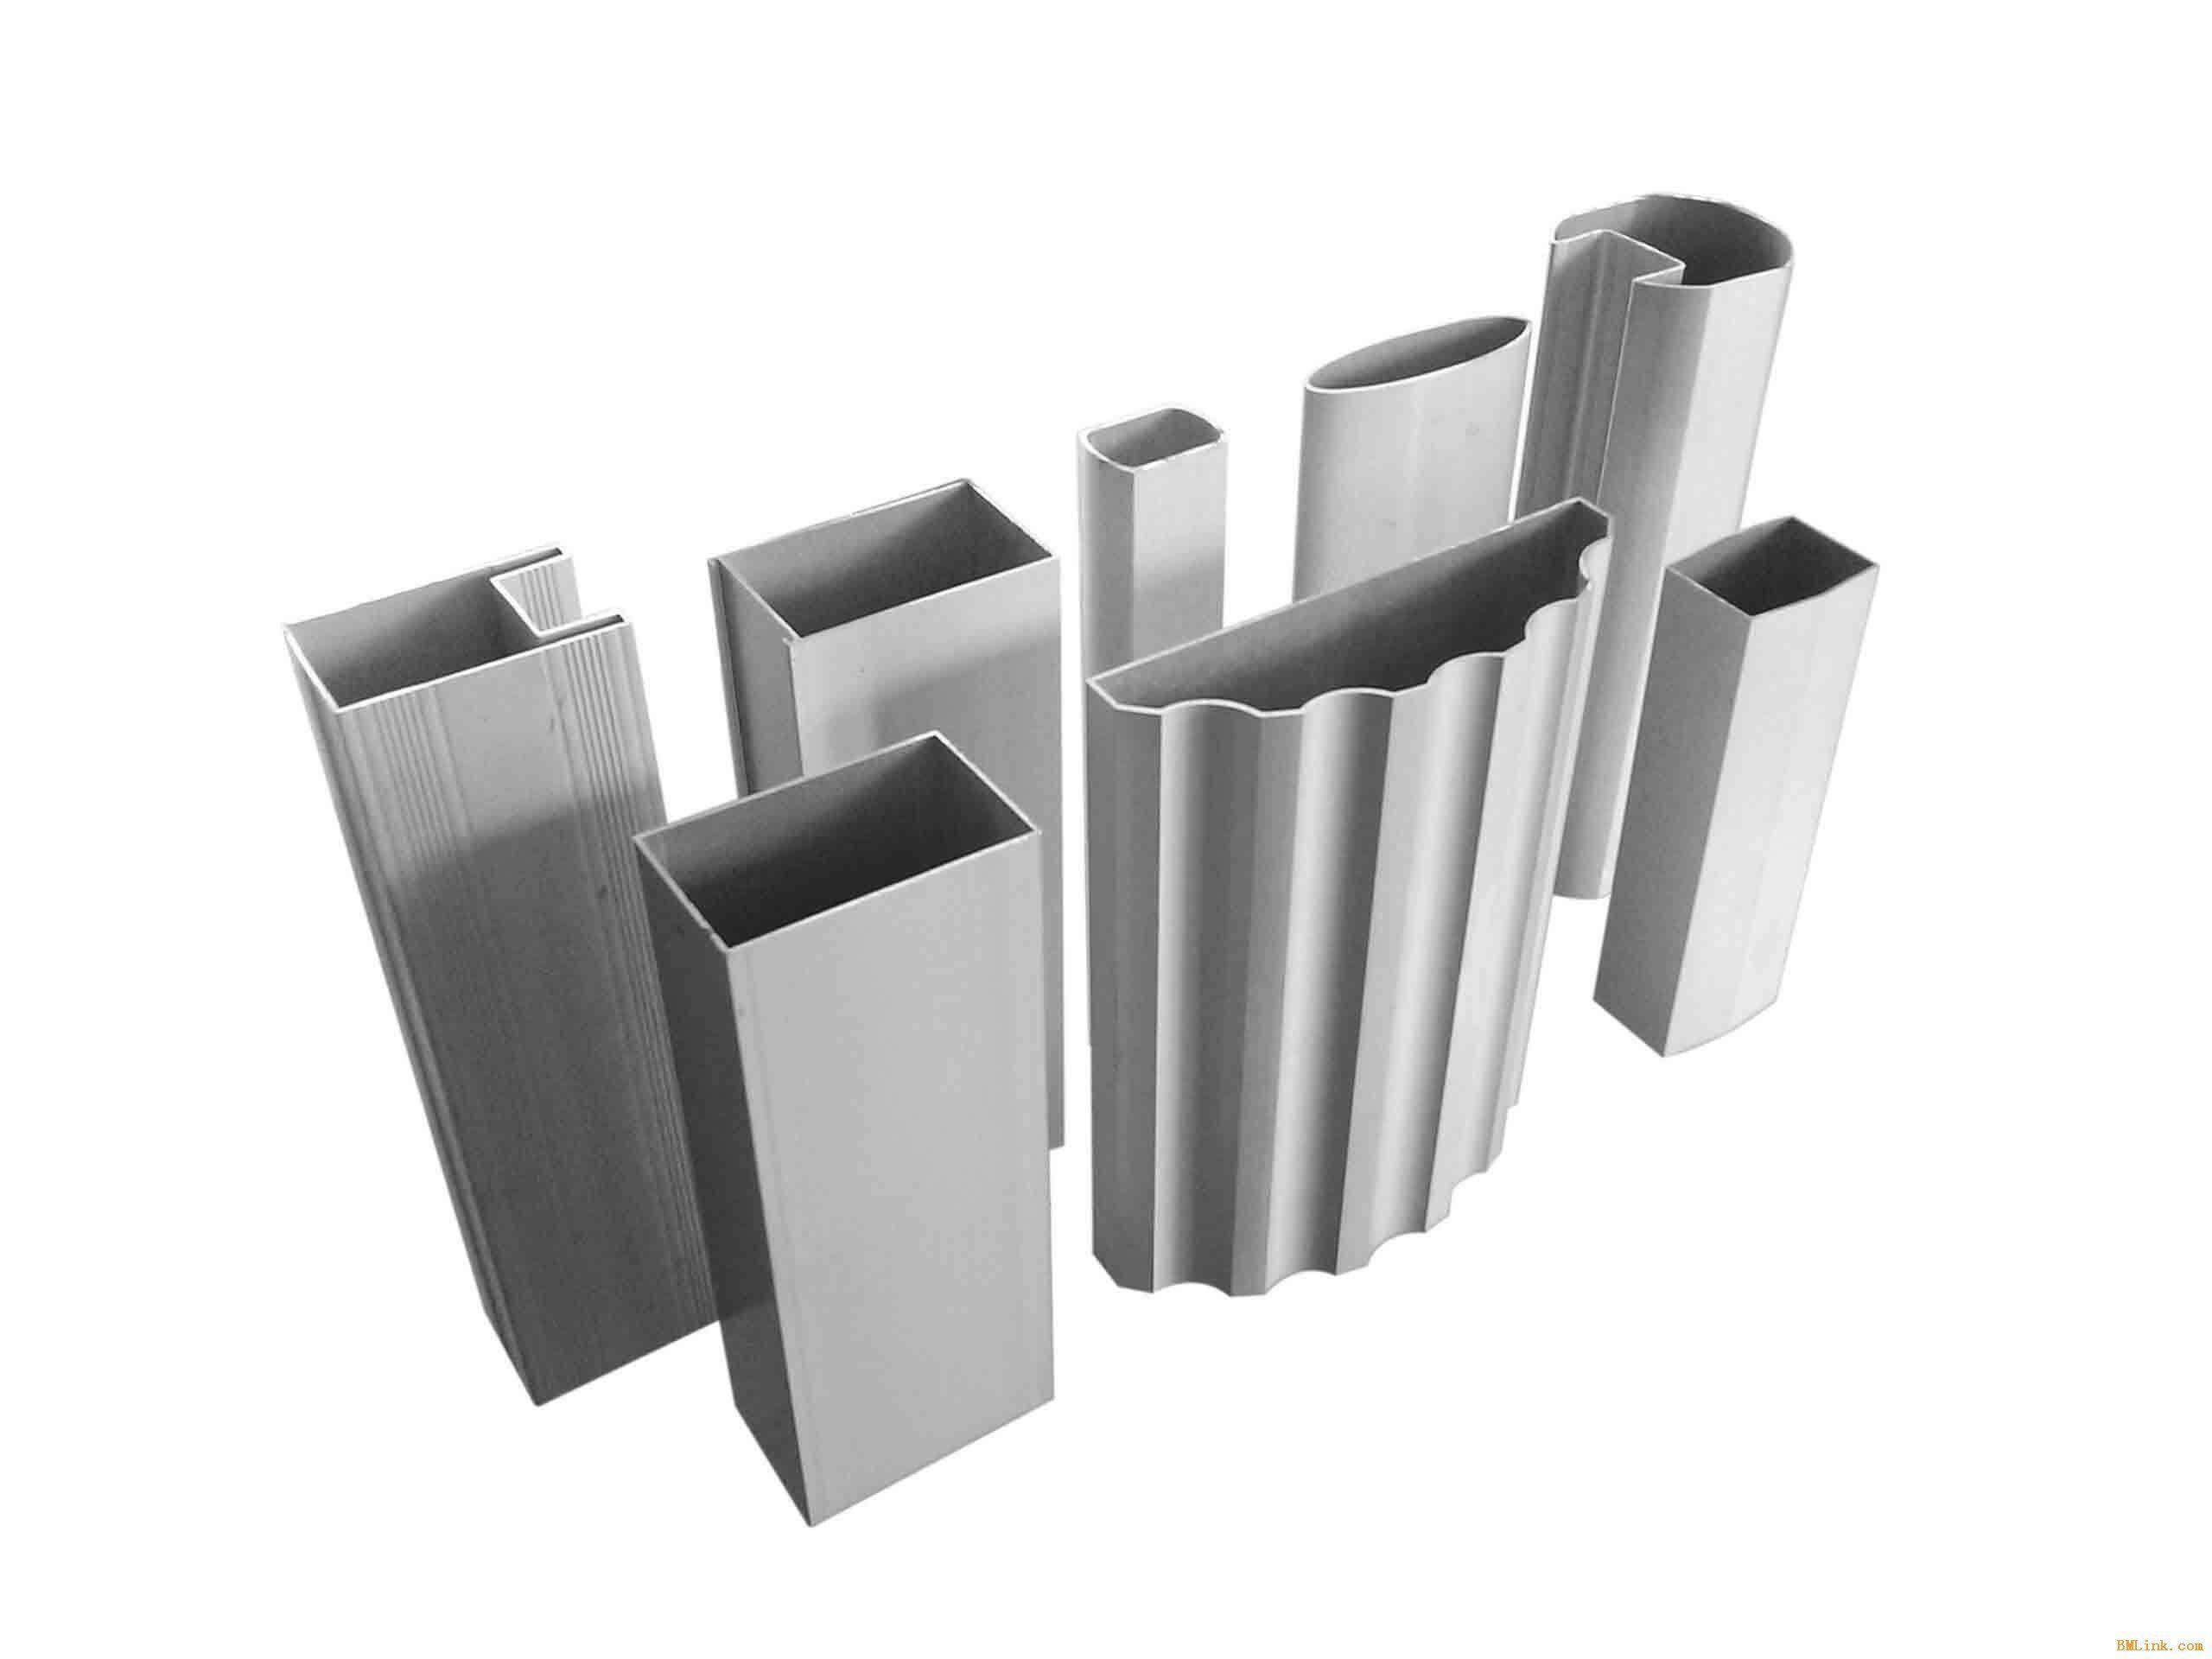 Tubo de alum nio da extrus o do ret ngulo tubo de - Tubo de aluminio ...